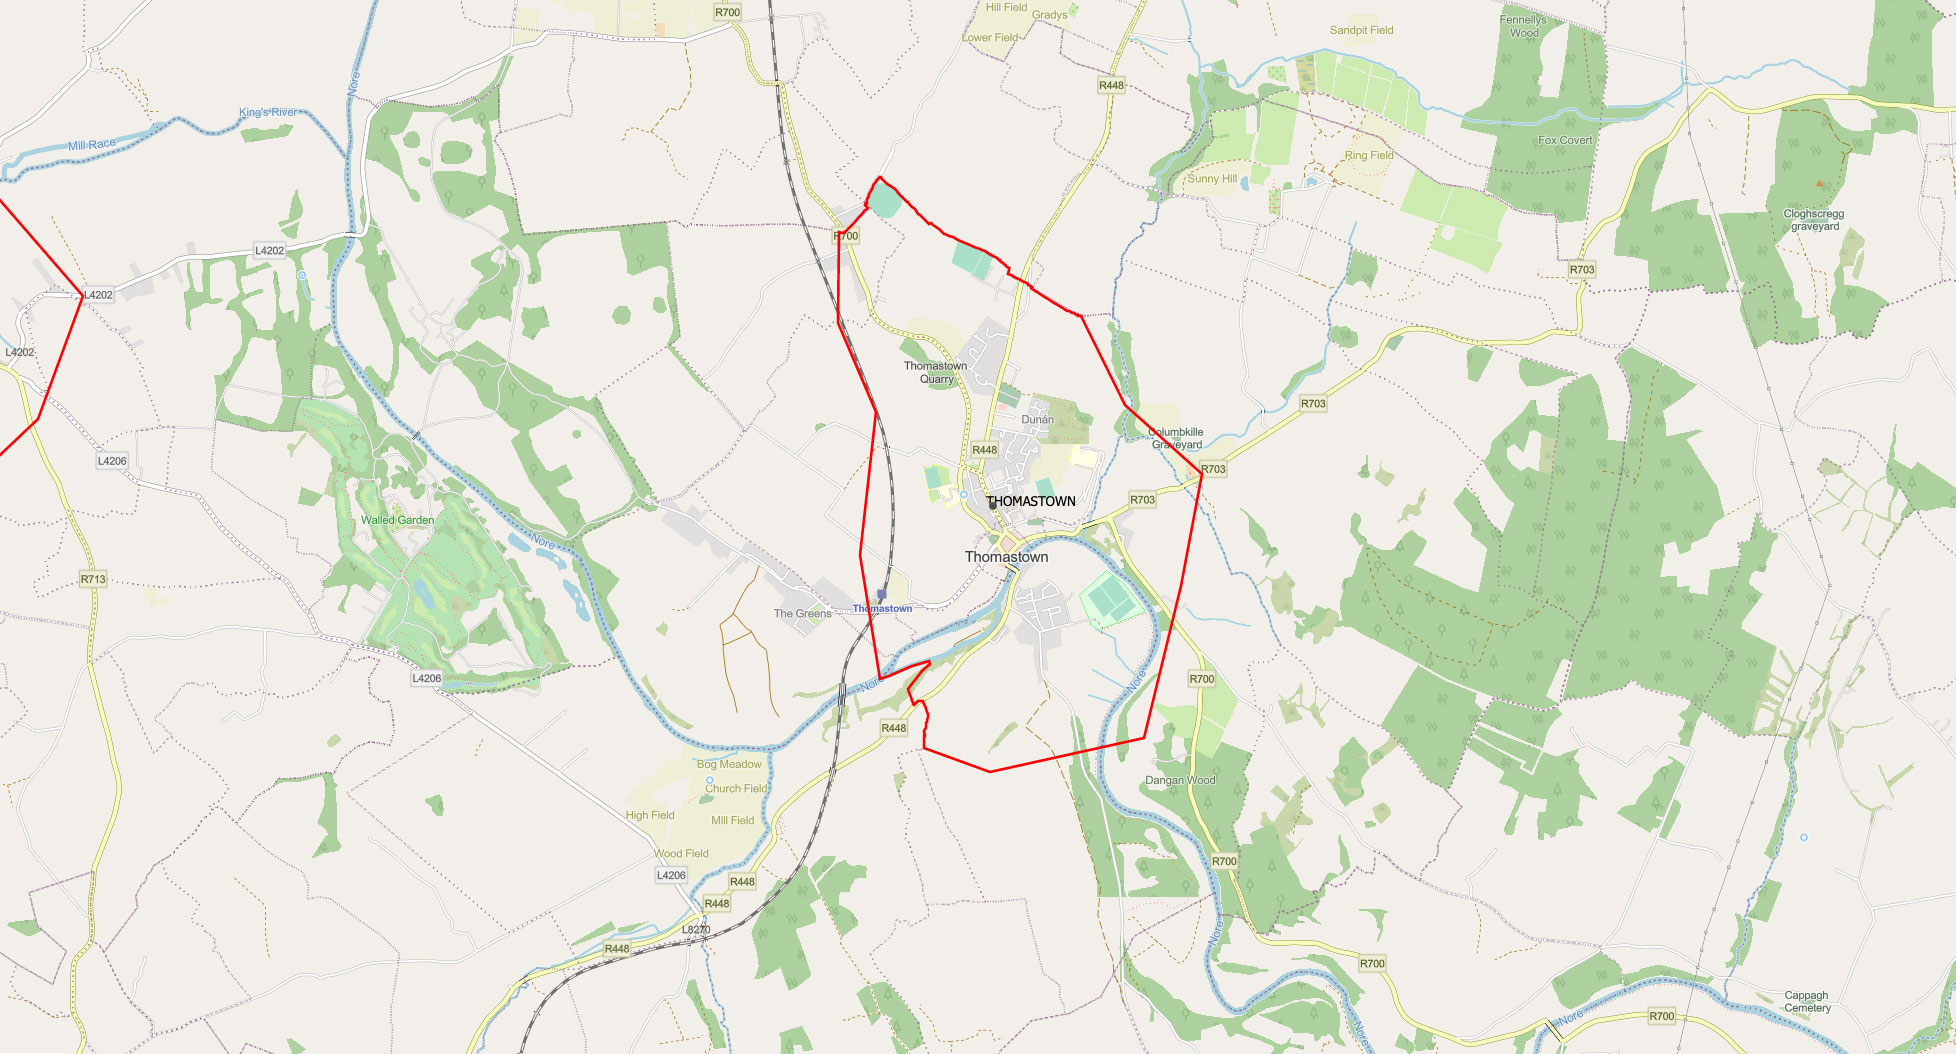 solar-panels-thomastown-kilkenny-ireland-map-img